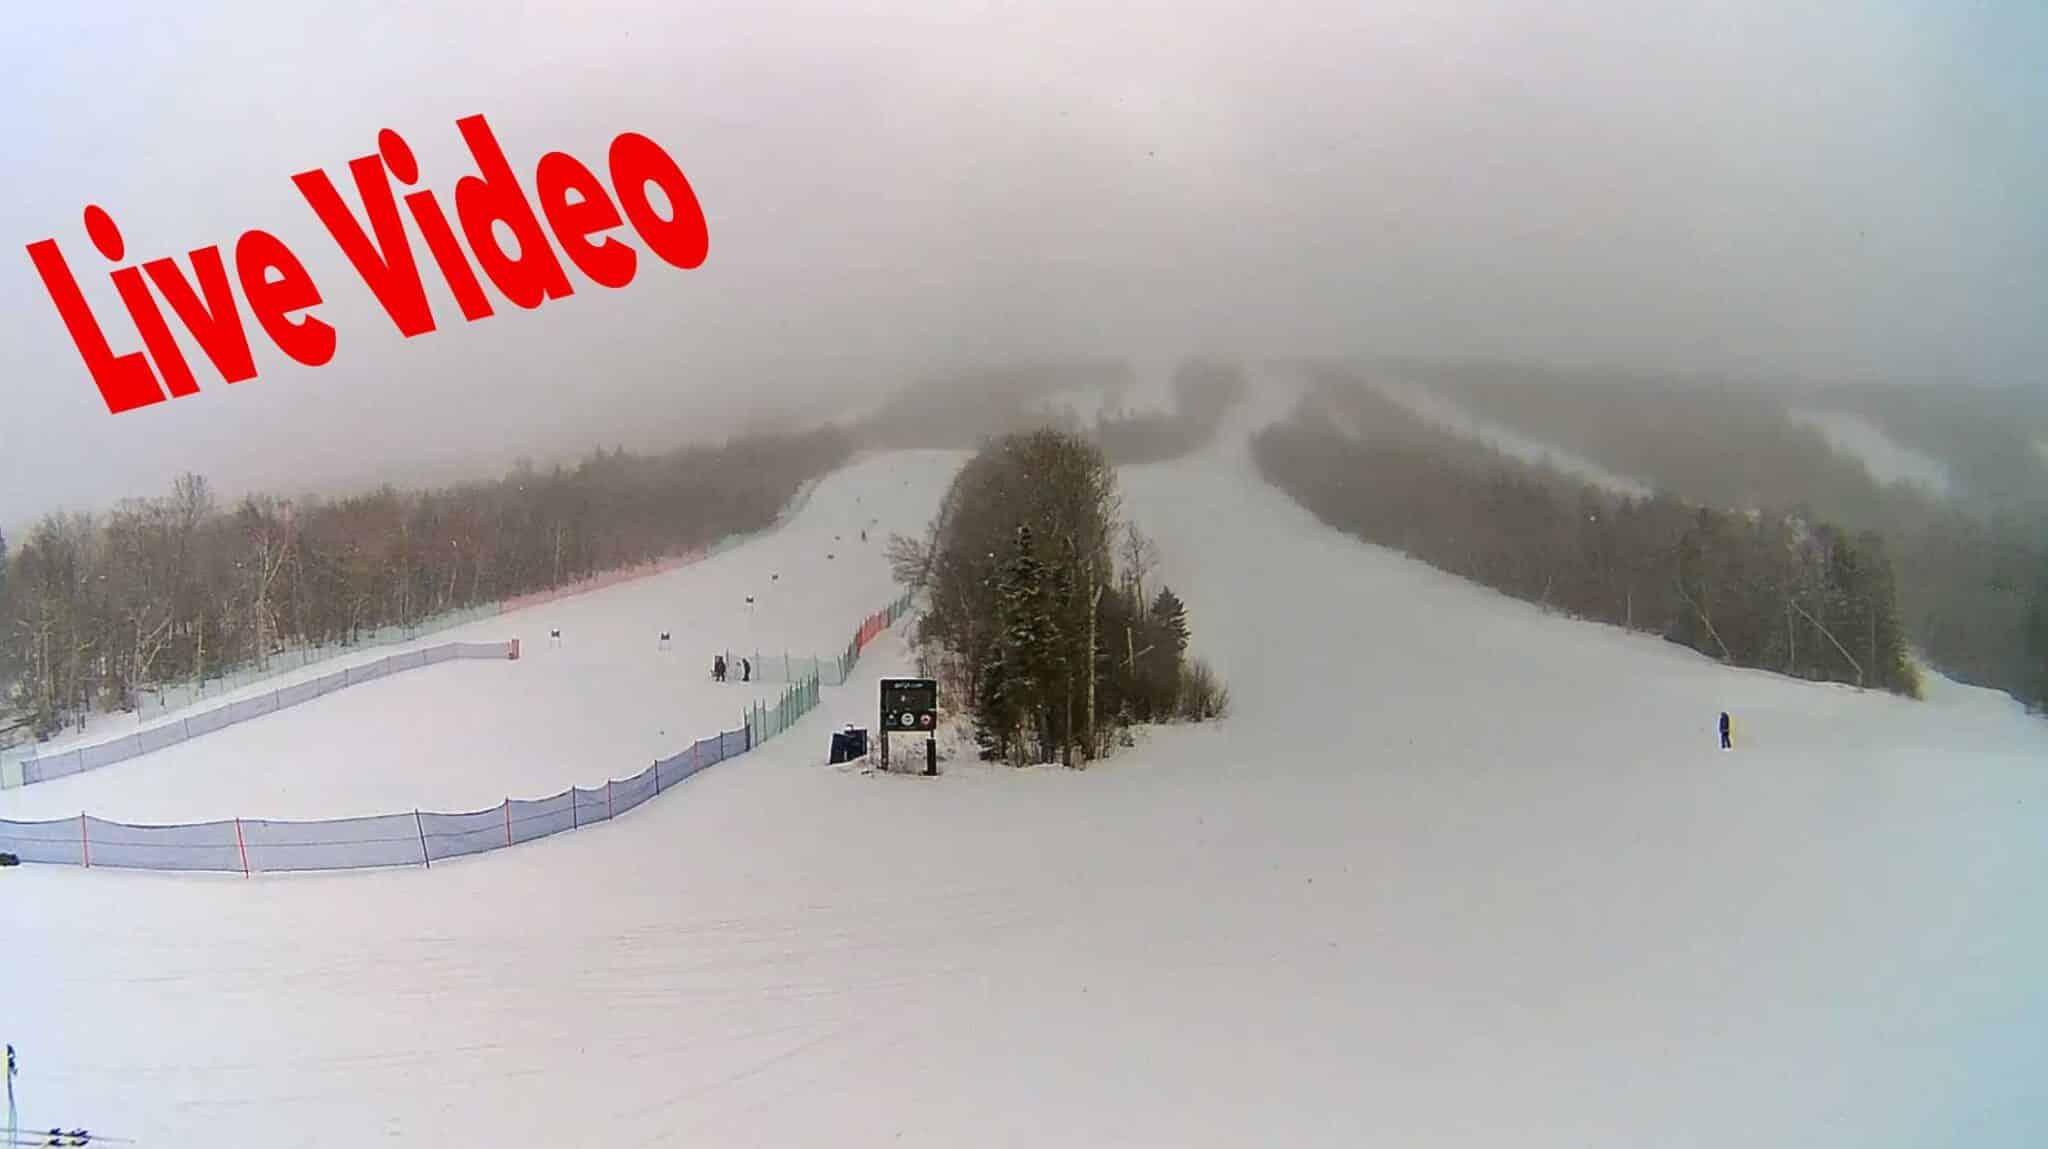 Sugarloaf Webcam